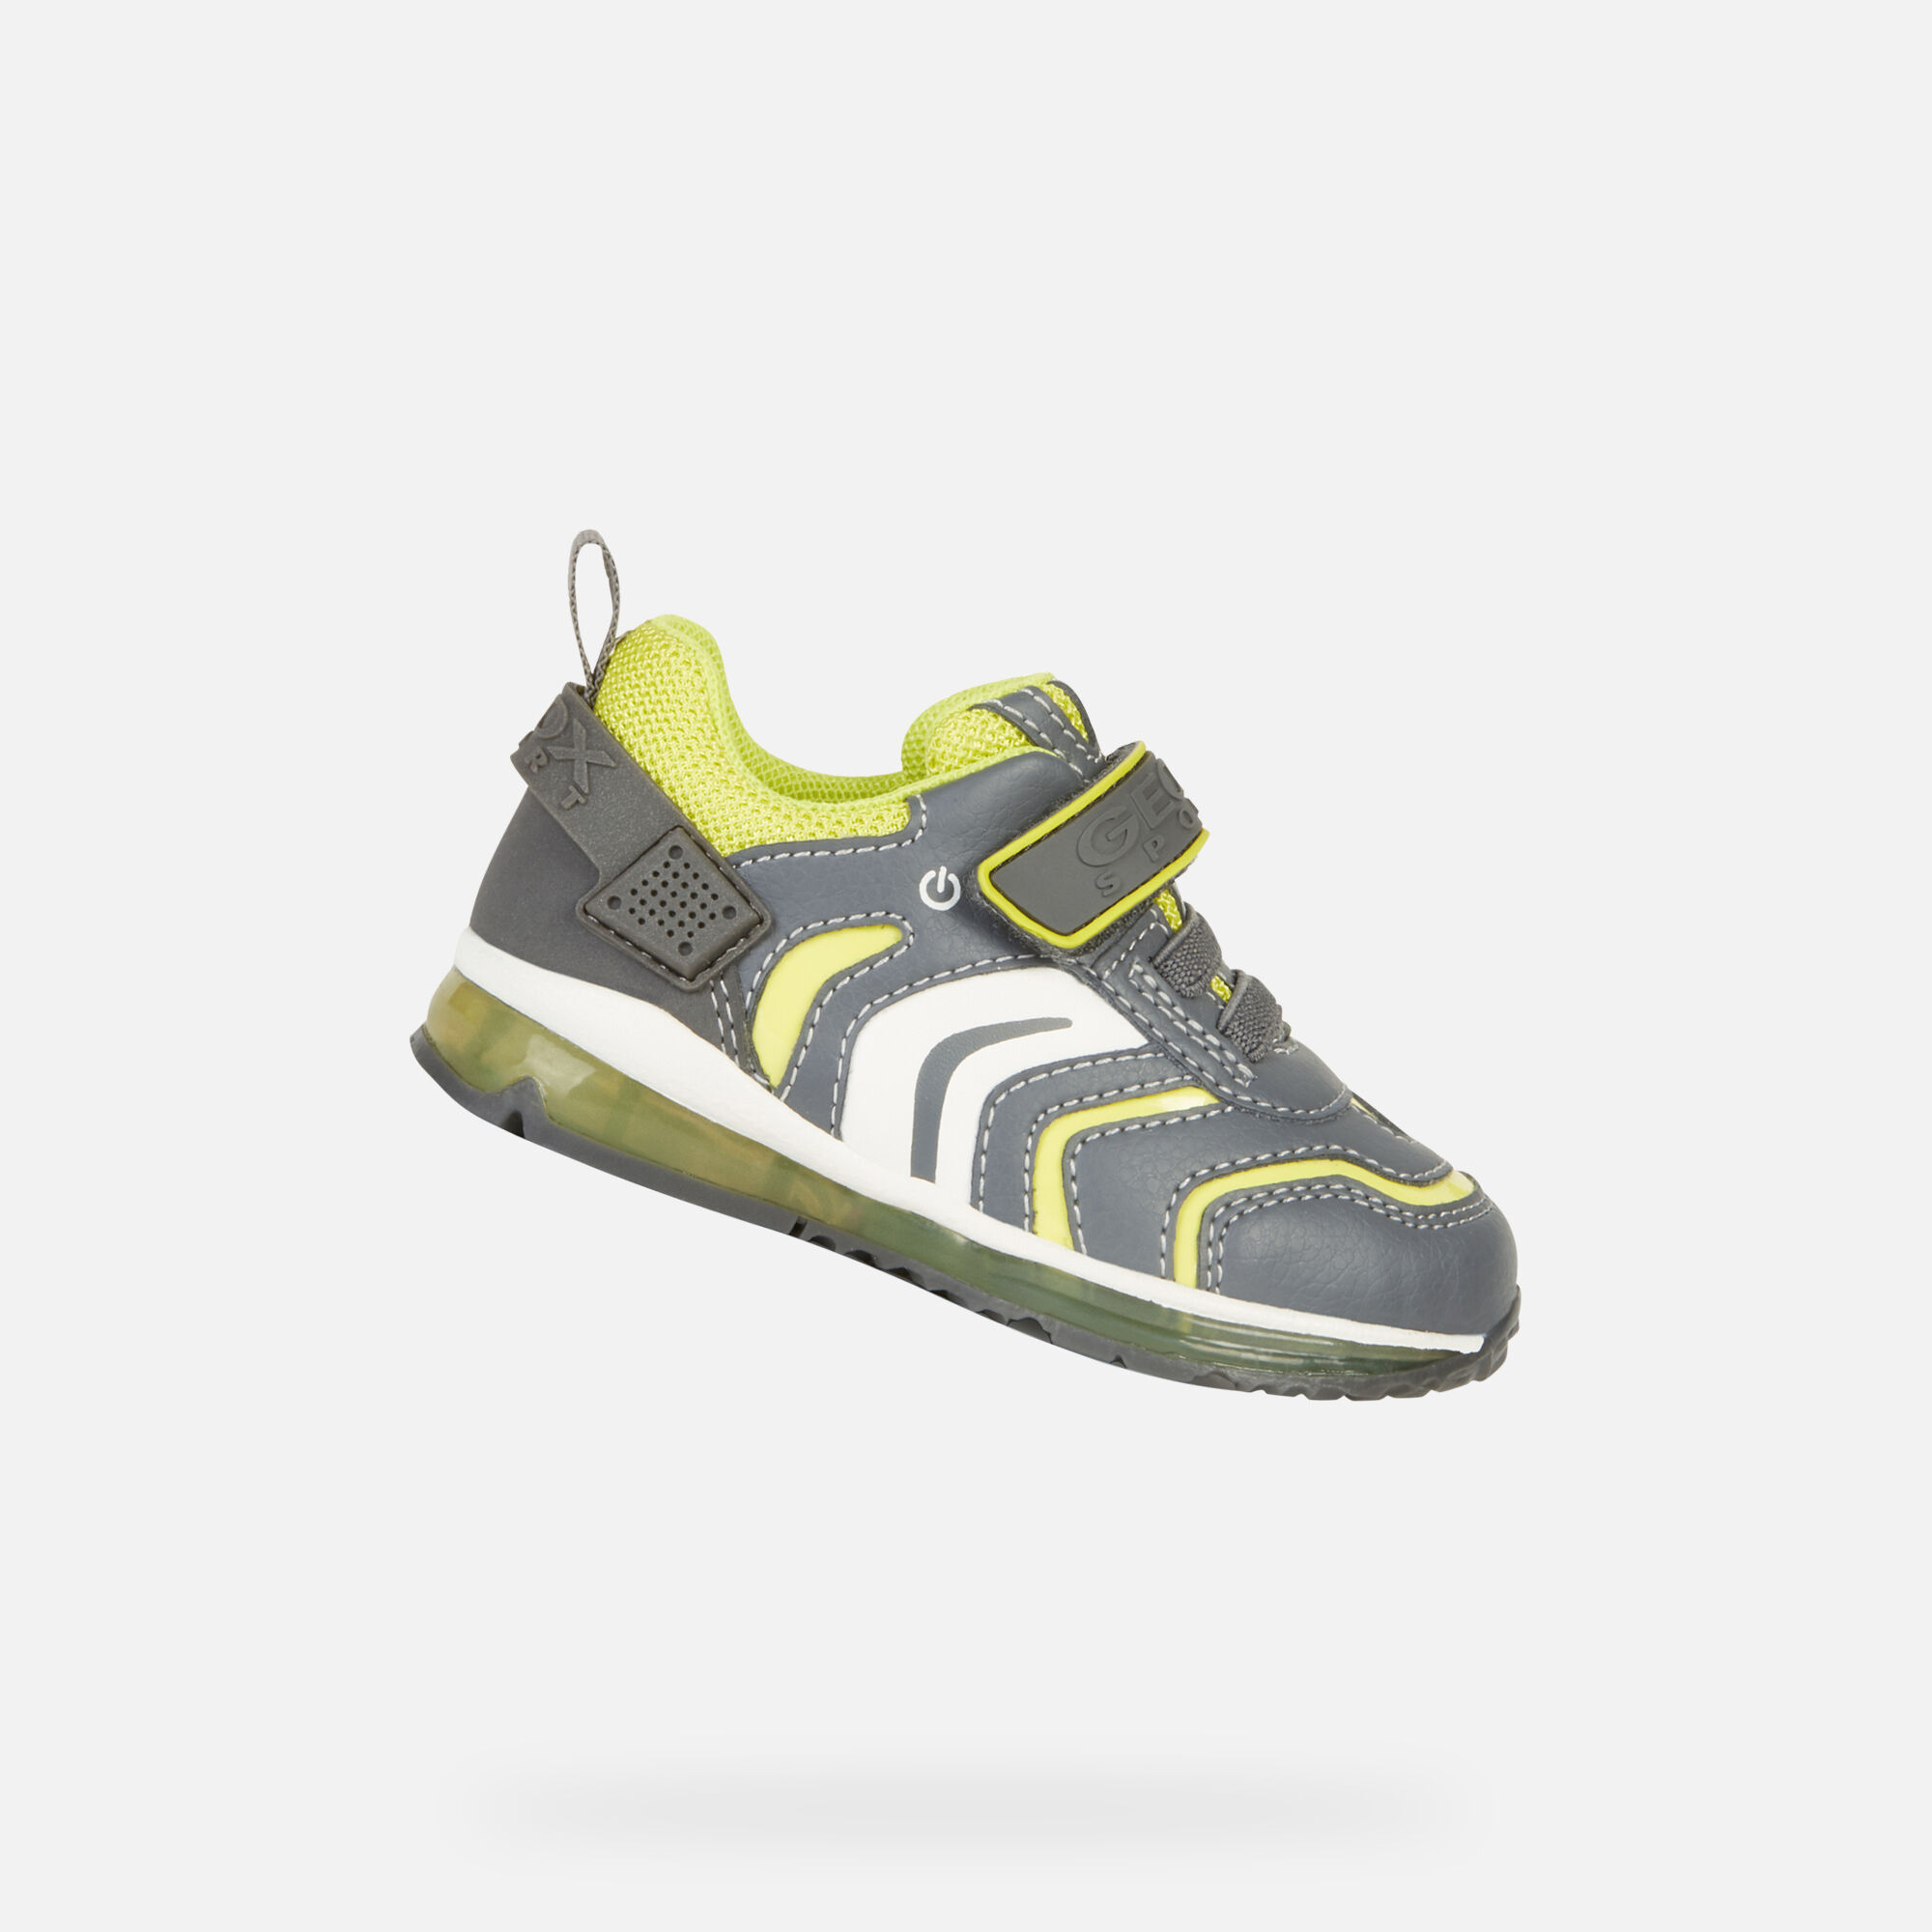 Chaussures Détente Homme Geox strada u4224c kaki 6925901